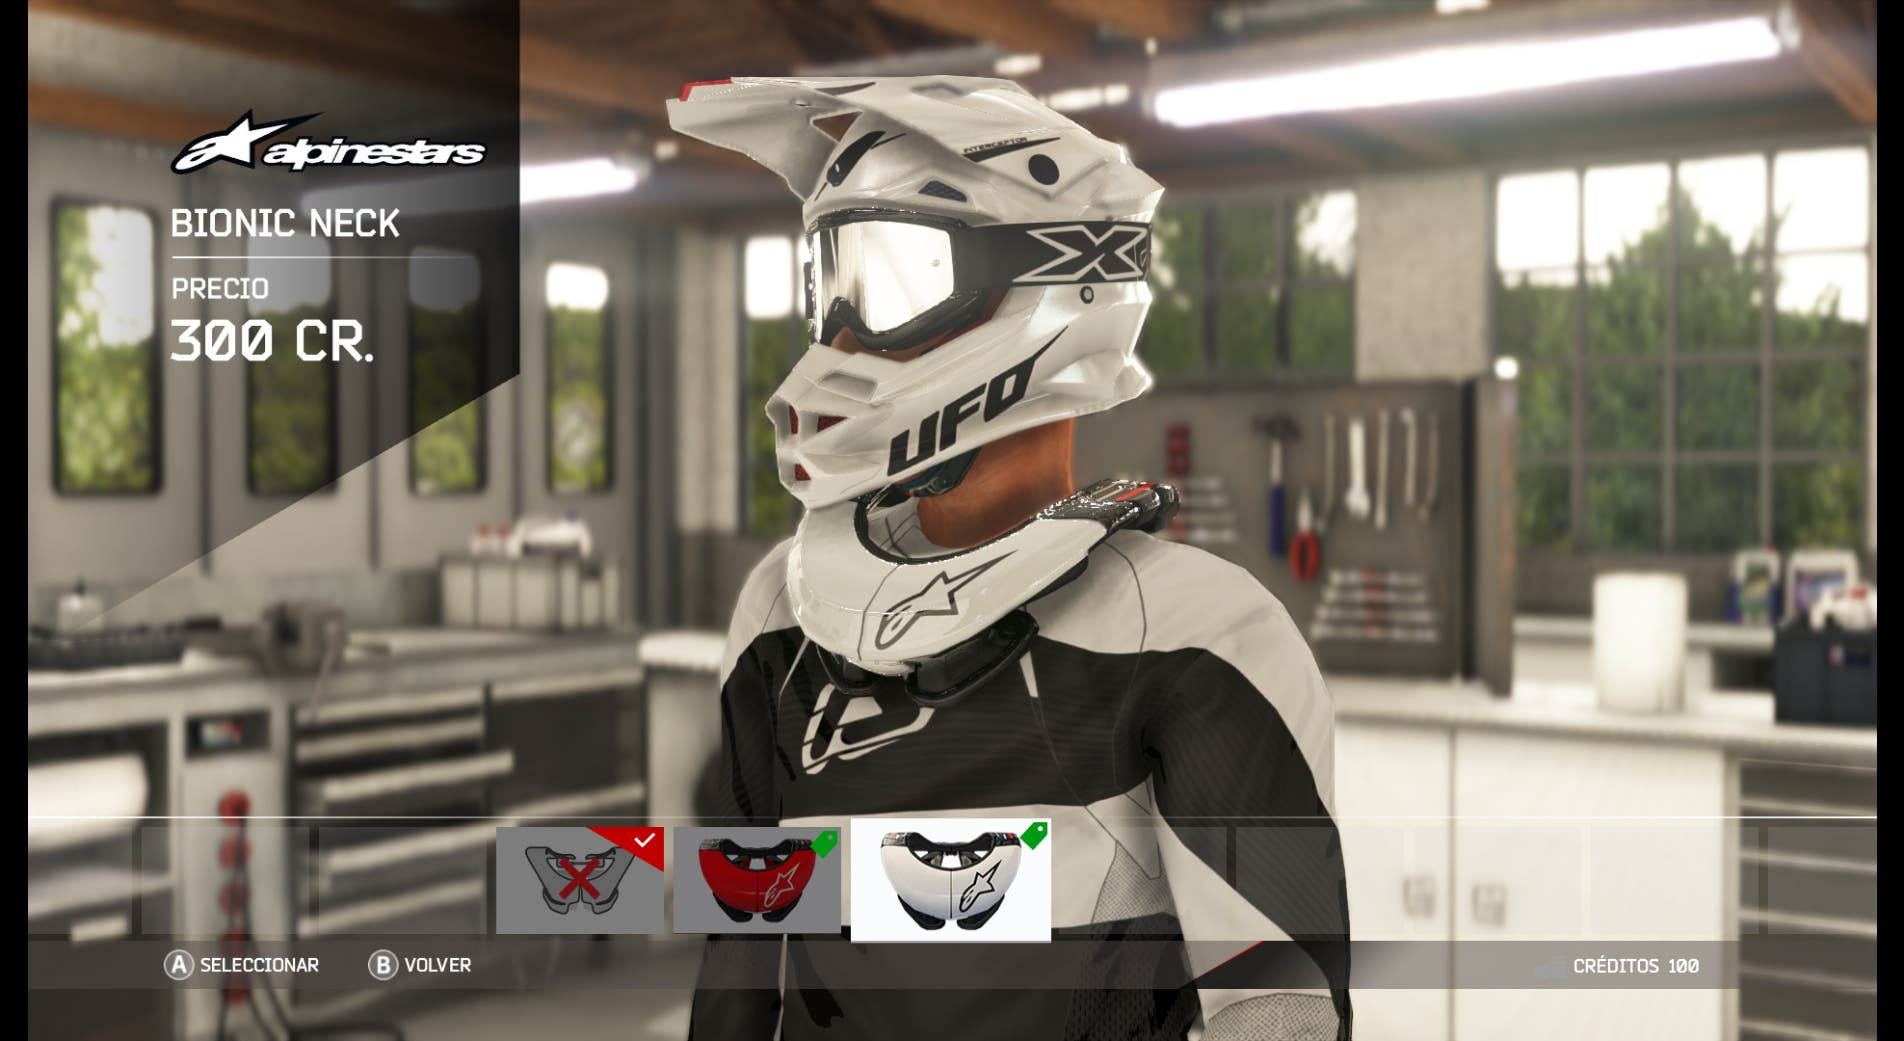 MXGP2 - The Official Motocross Videogame 08_04_2016 11_20_22